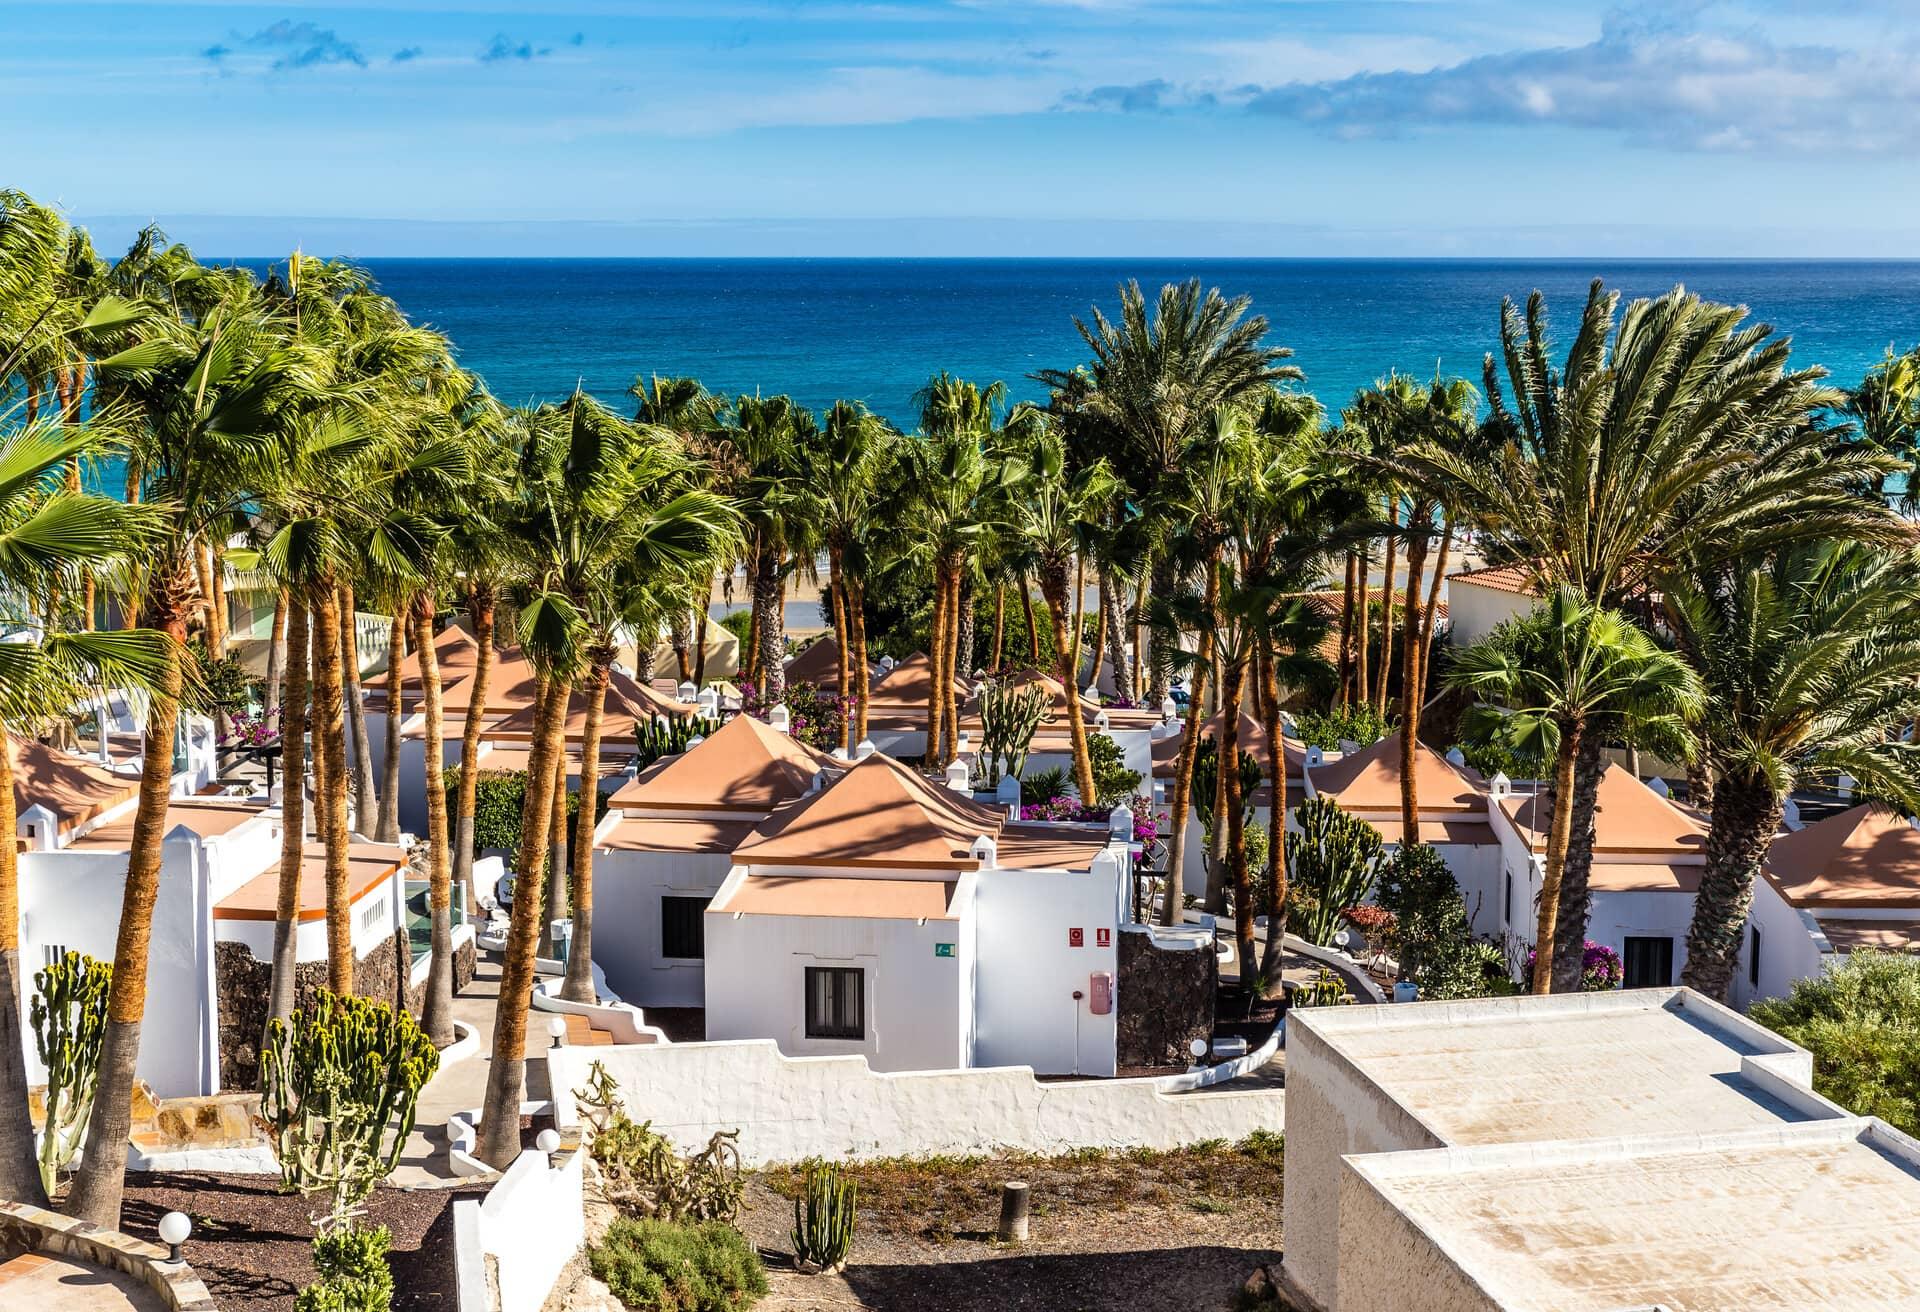 Fuerteventura Spagna